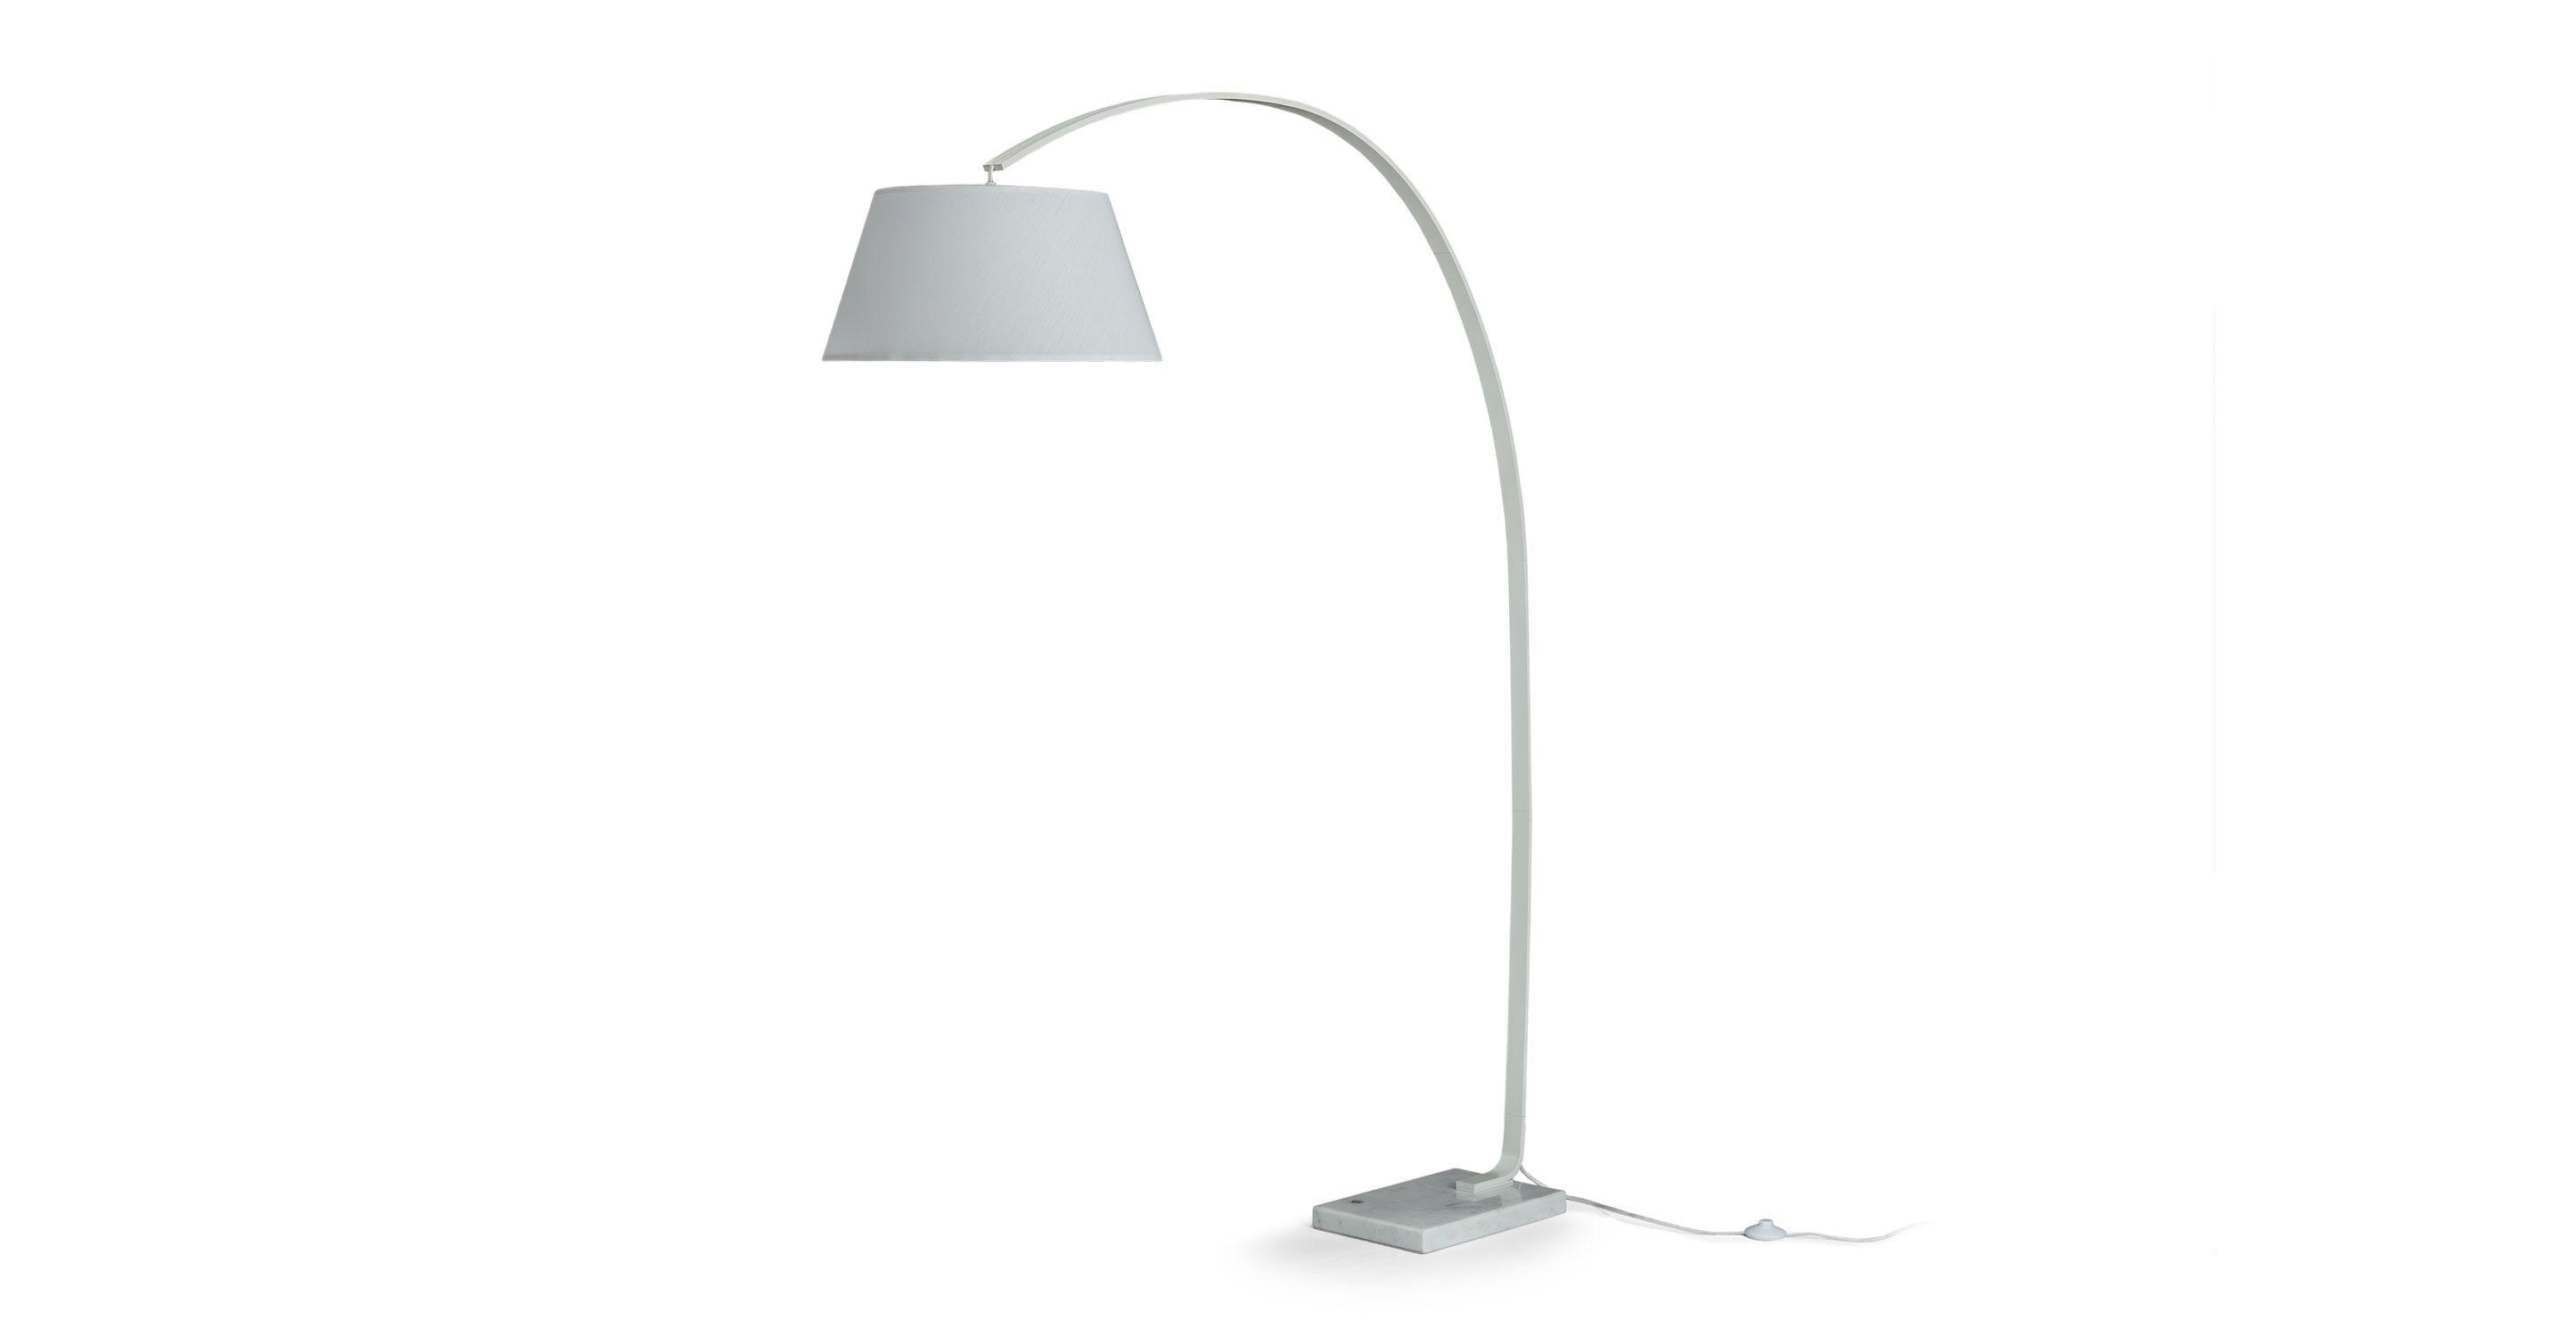 Willo White Floor Lamp Lighting Article Modern Mid Century